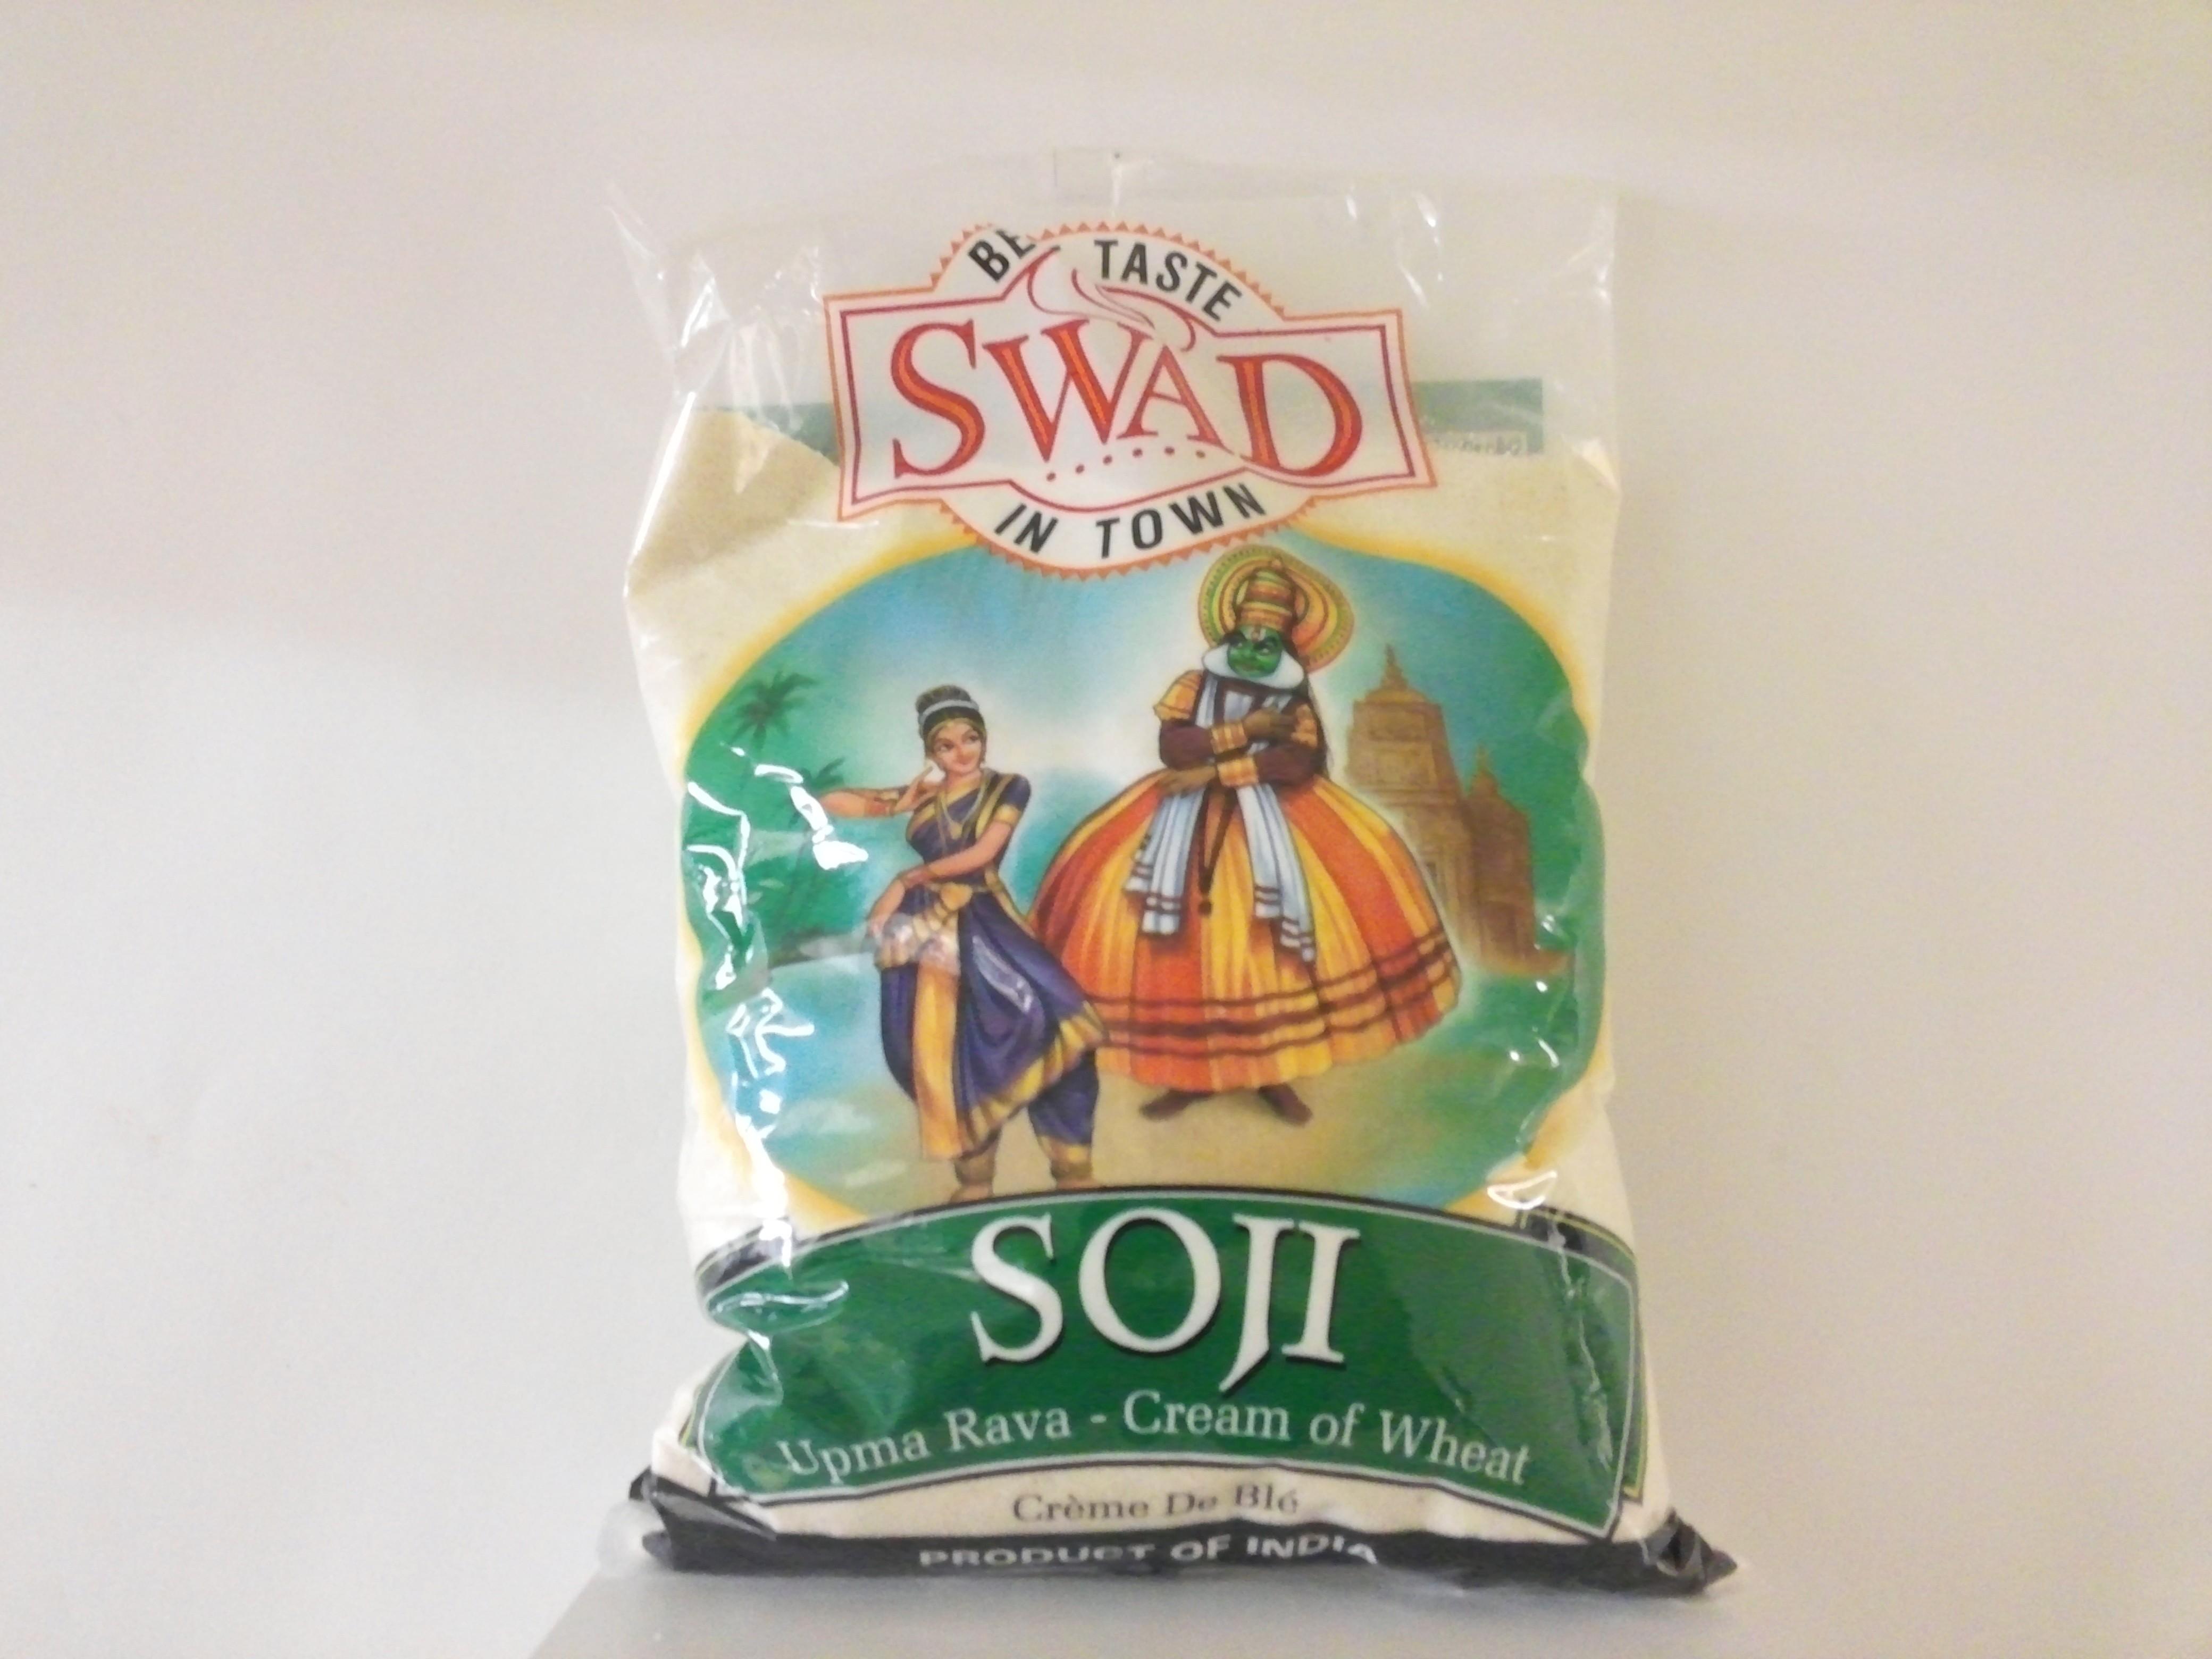 Sooji course 4 lbs